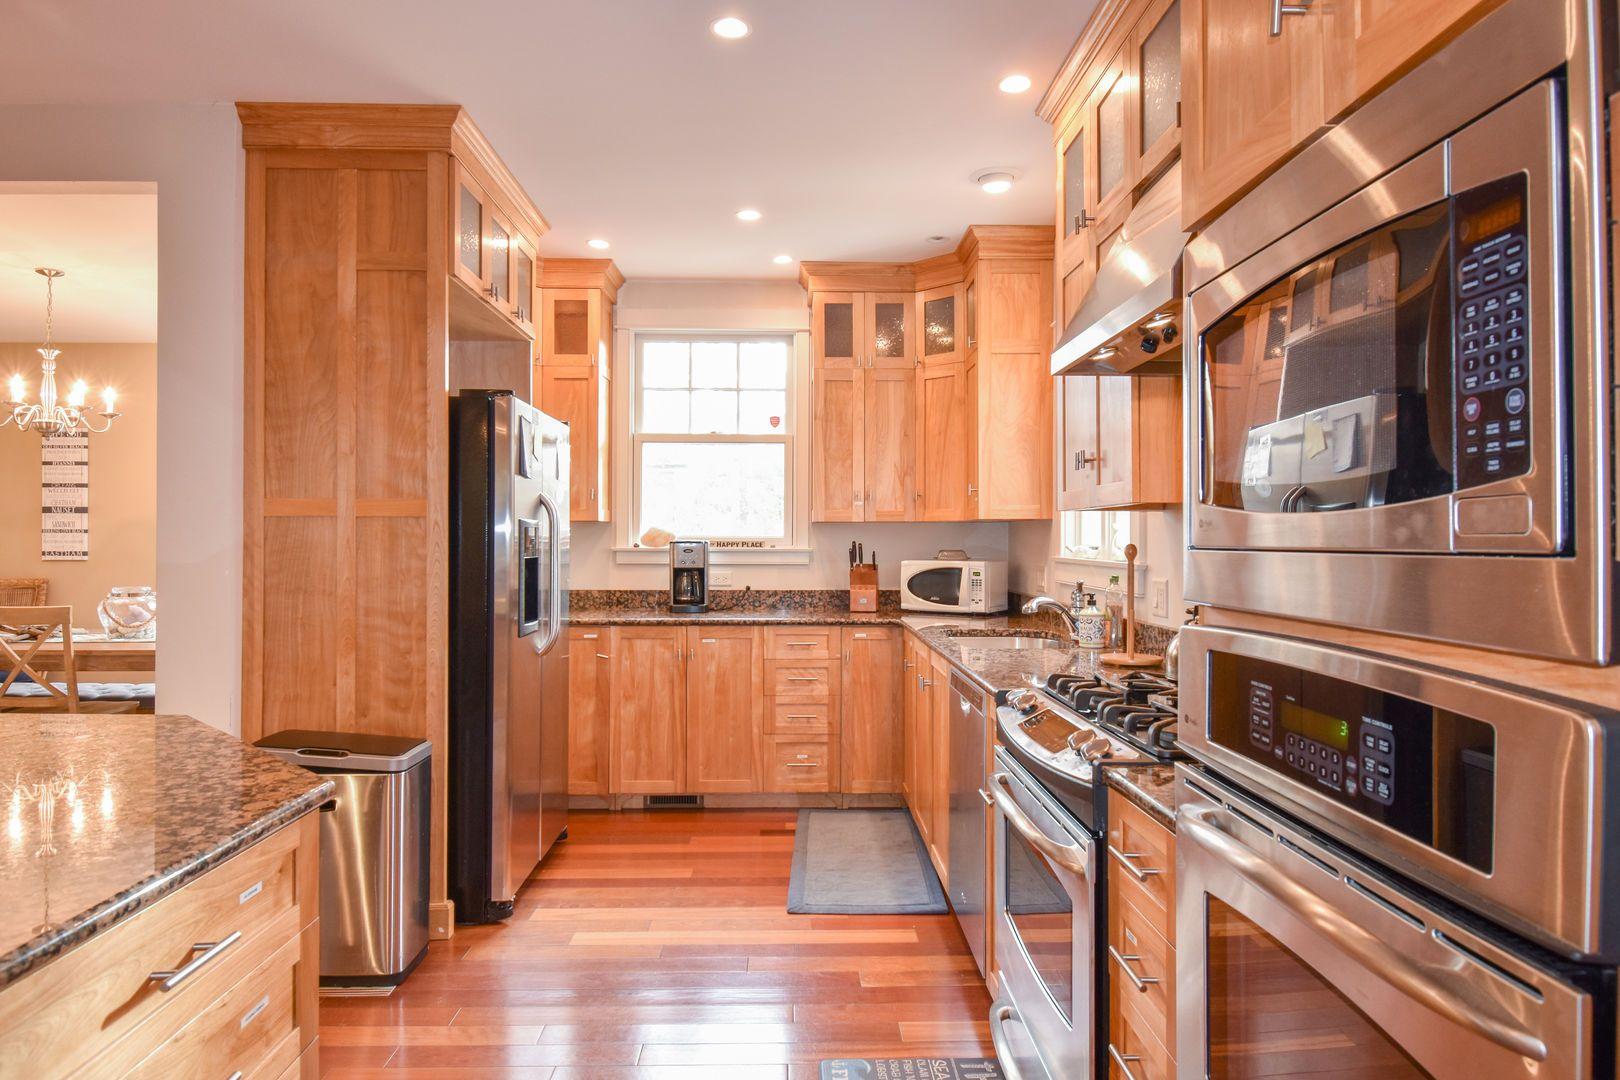 Kitchen remodel double oven kitchen kitchen remodel